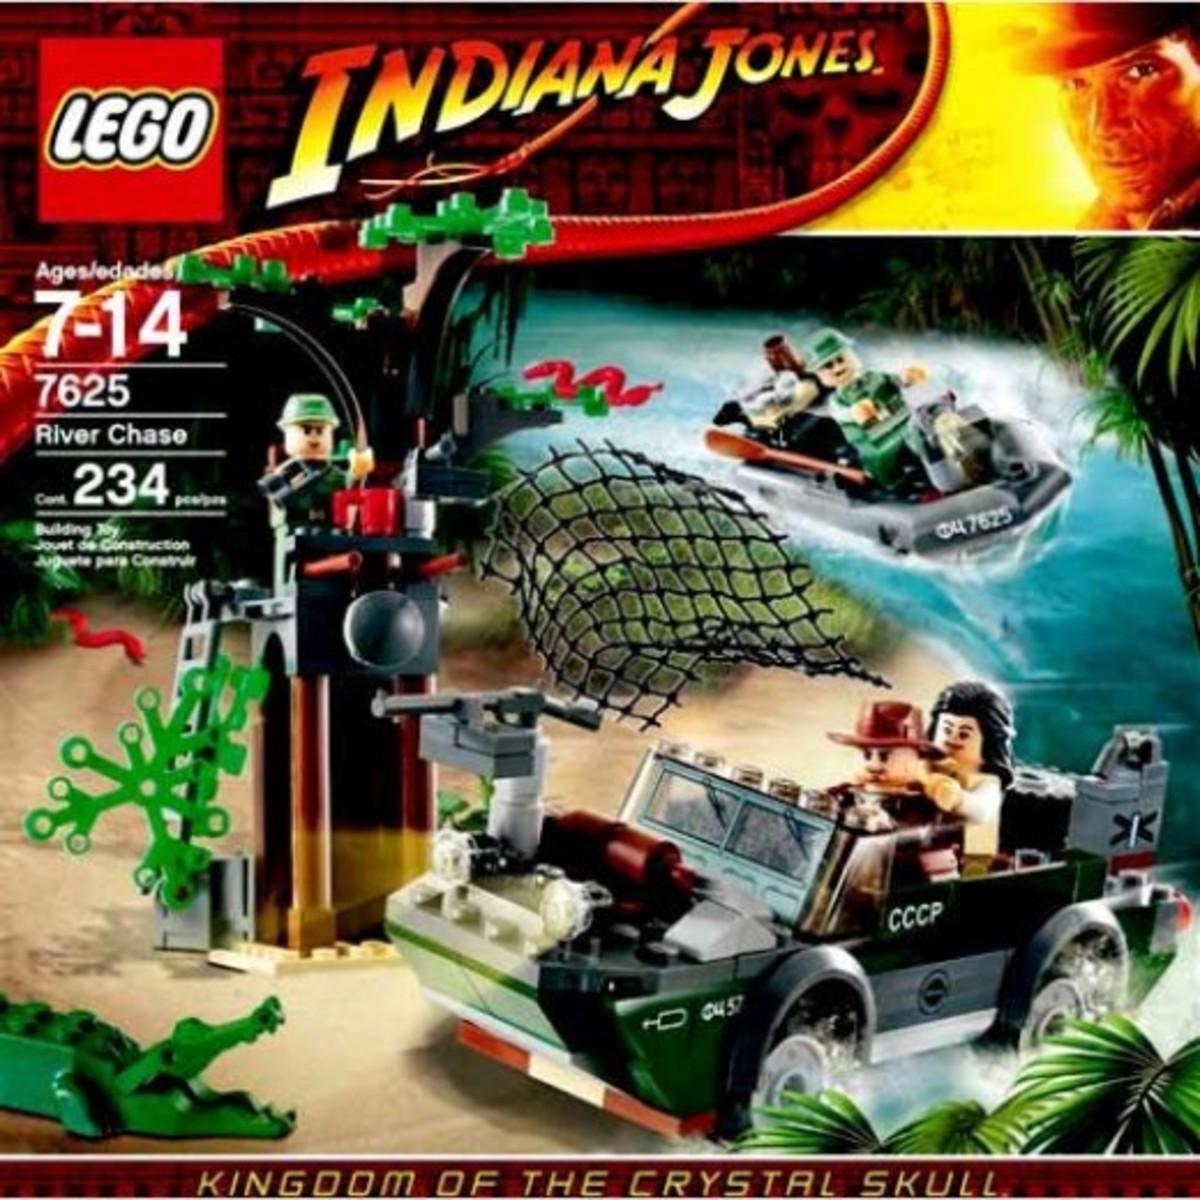 Lego Indiana Jones River Chase 7625 Box